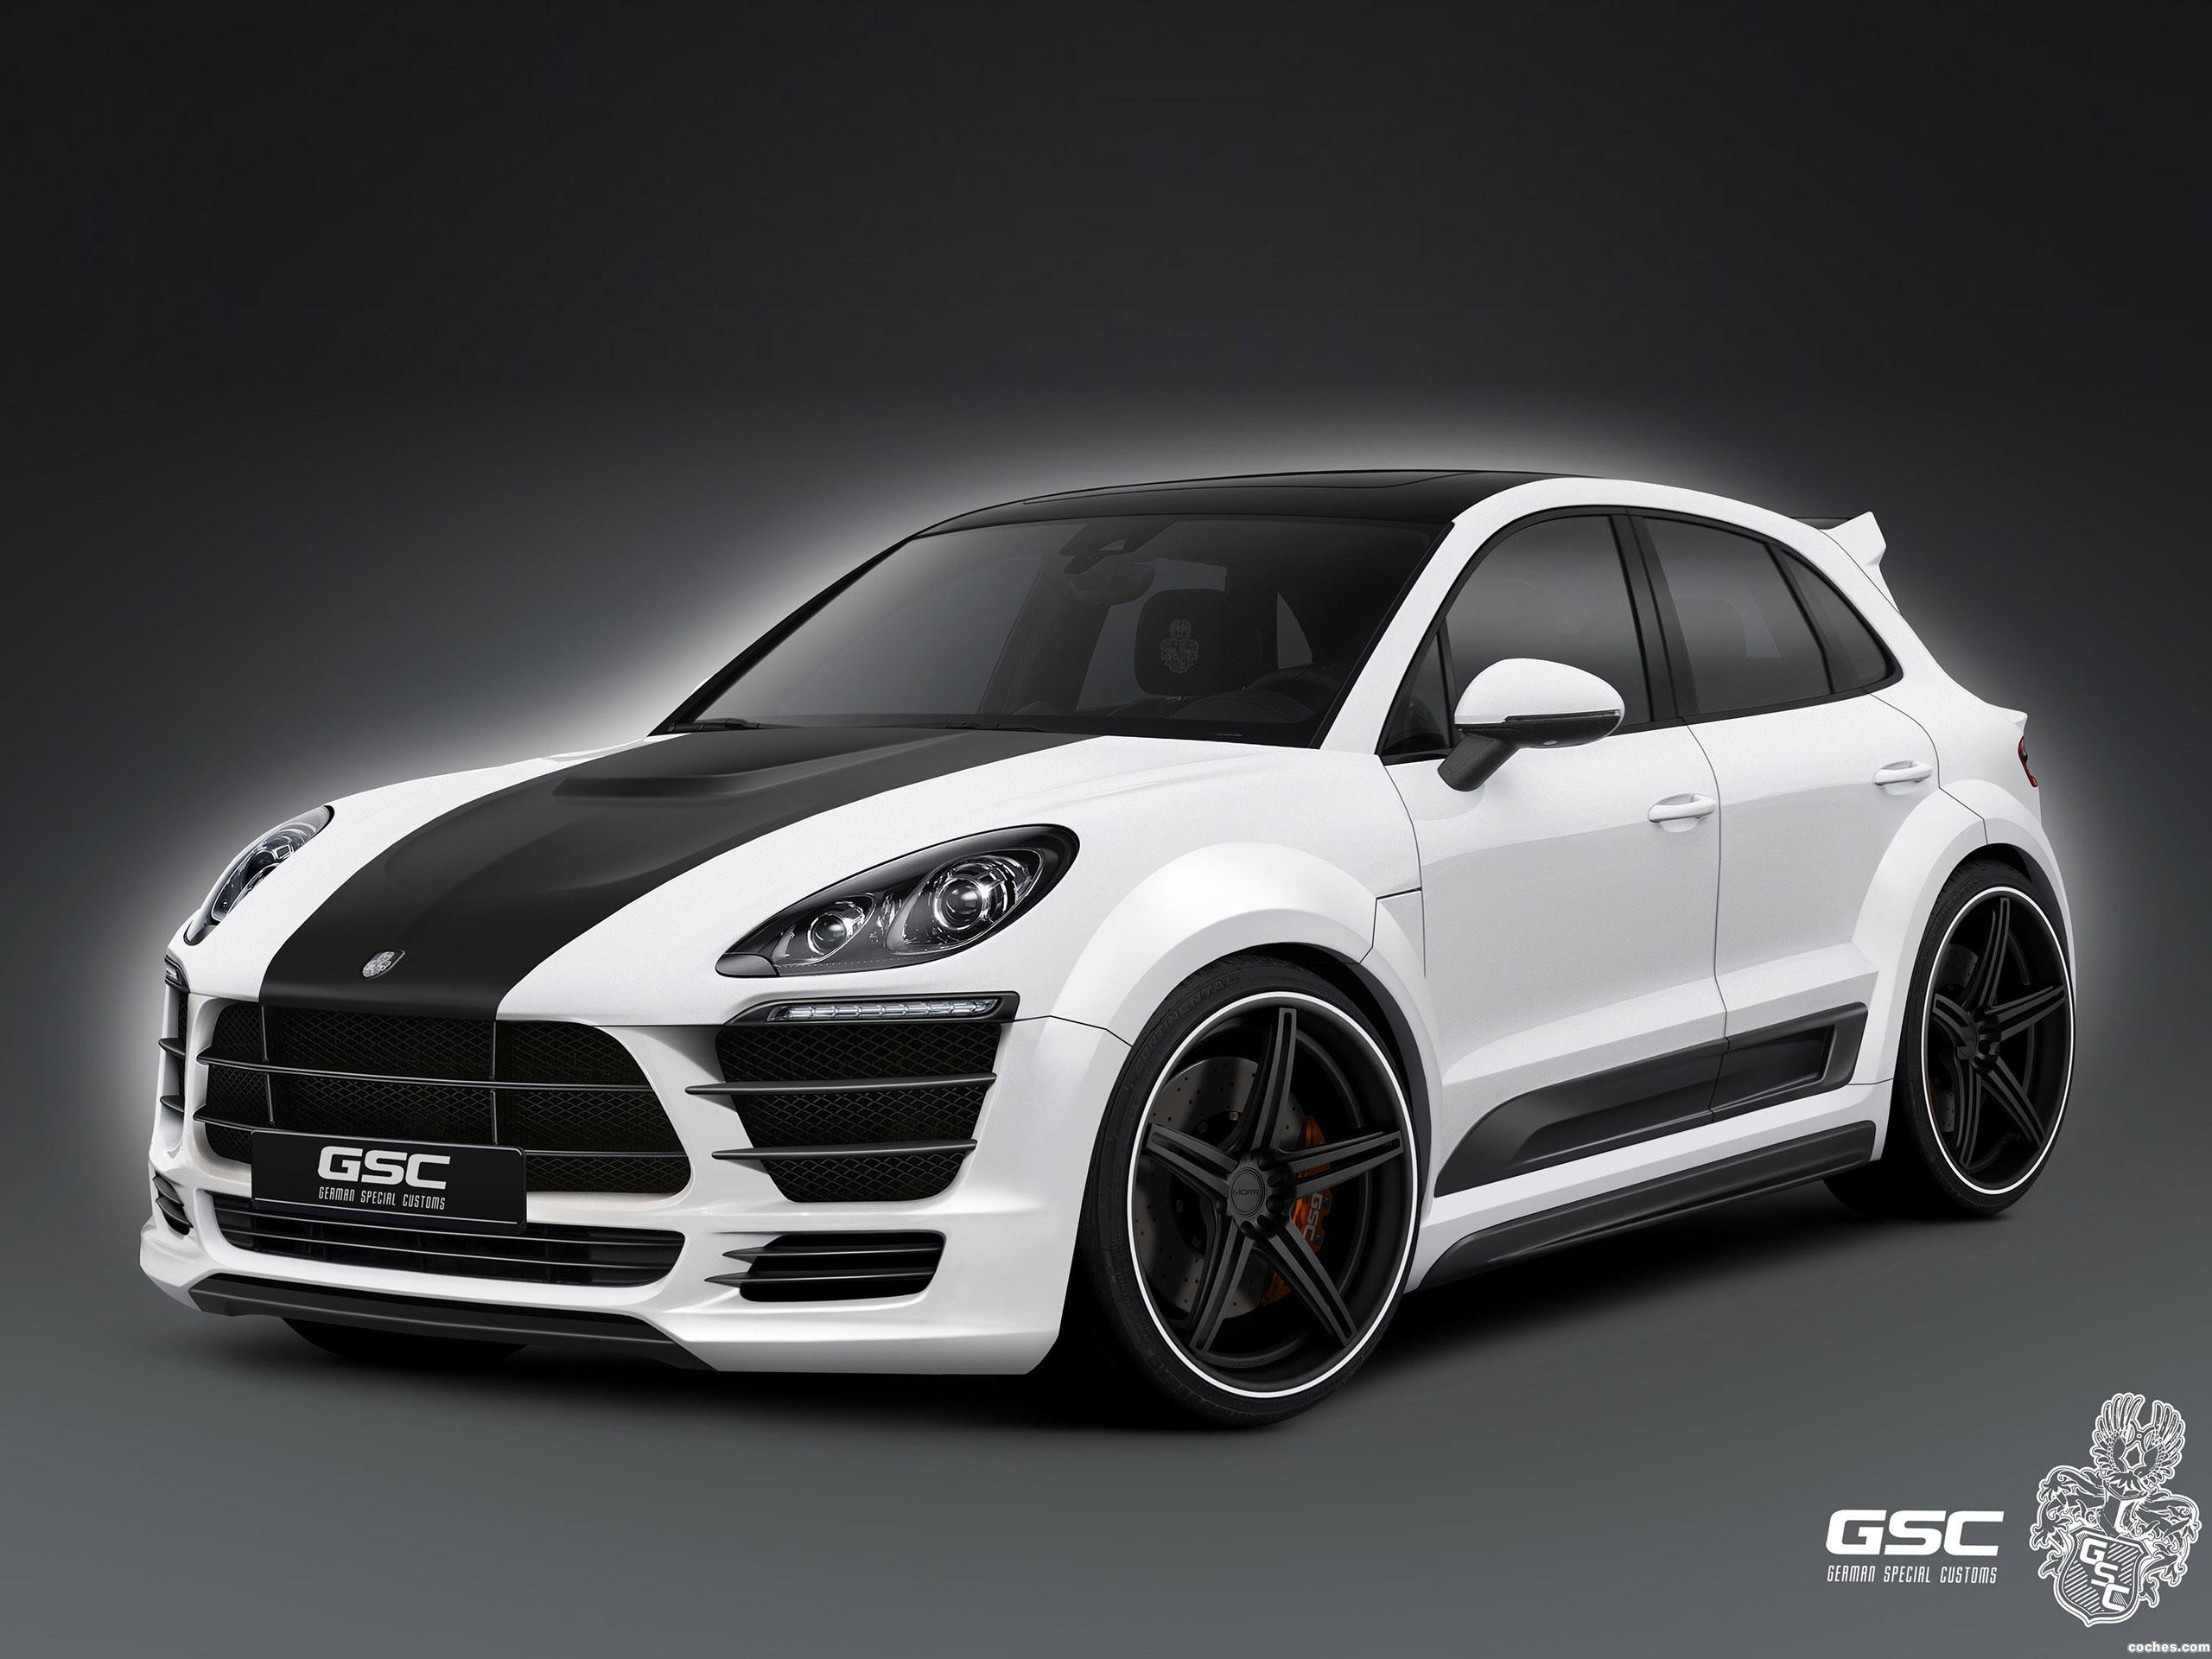 Foto 0 de Porsche GSC Macan 2014